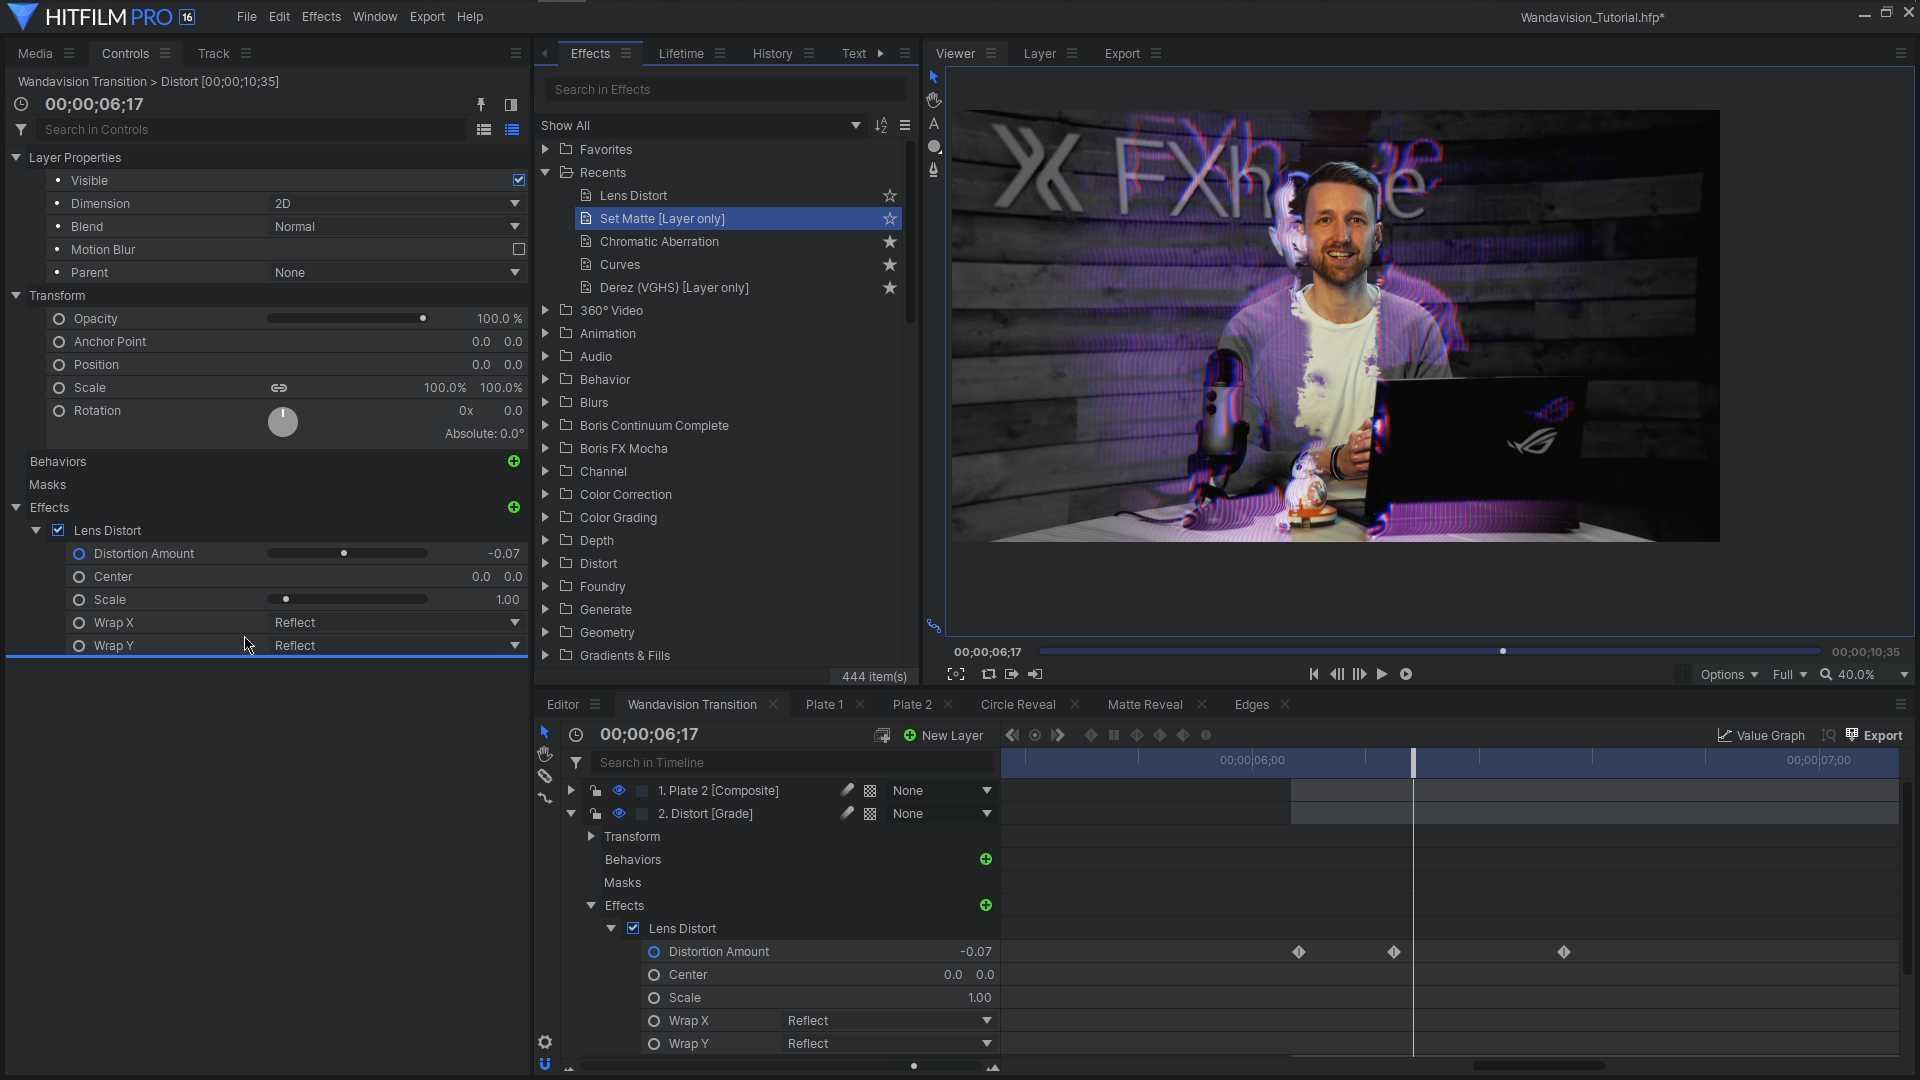 HitFilm Pro interface - Reality glitch effect